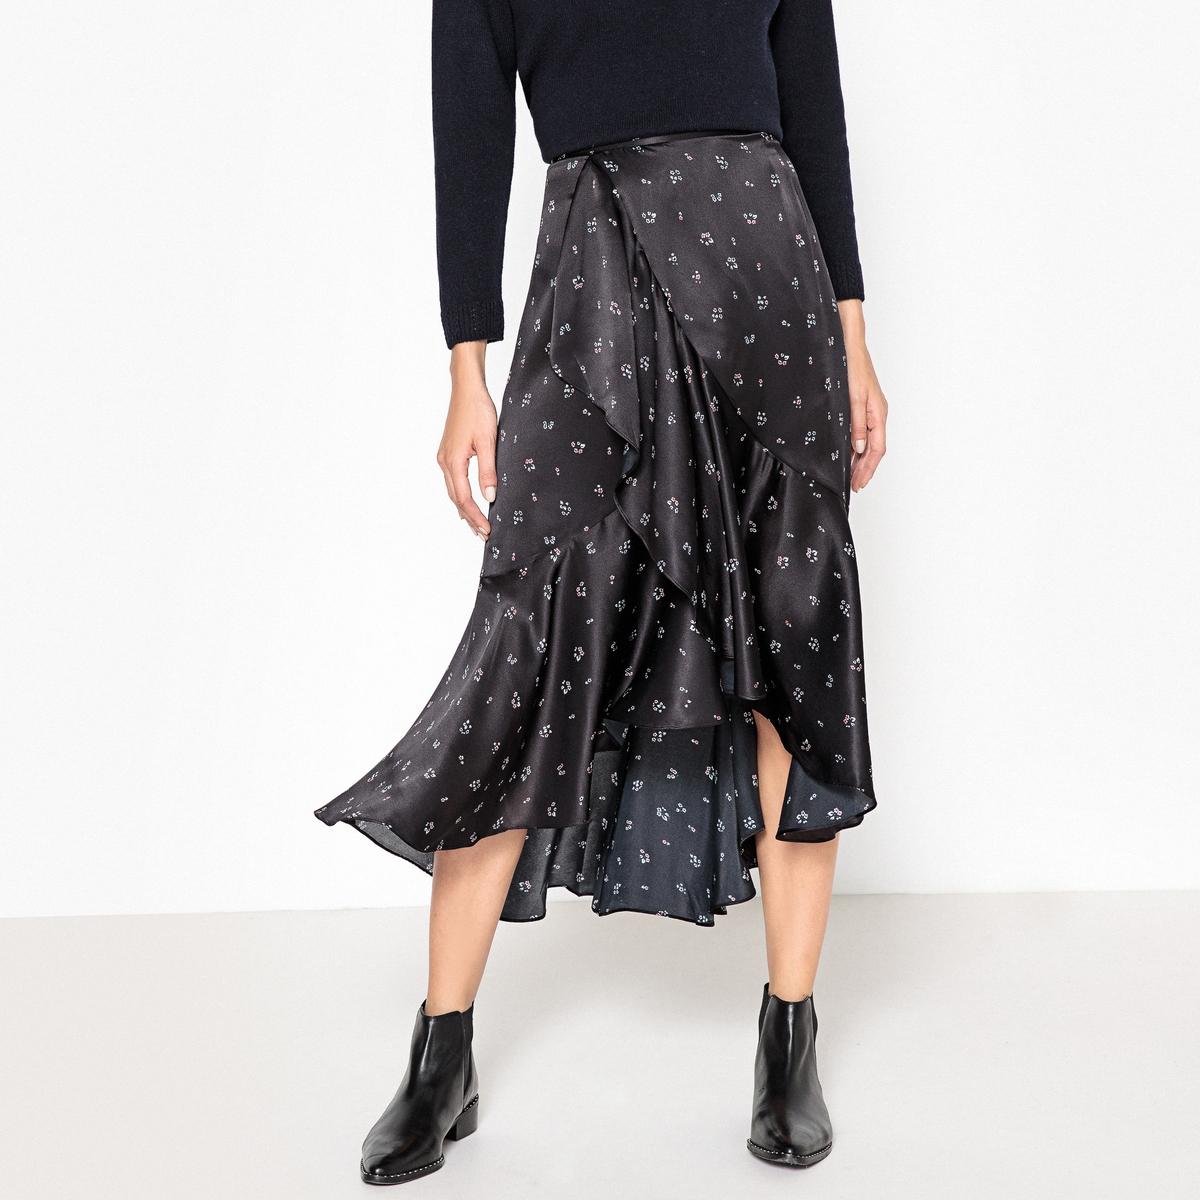 Юбка с запахом из шелка iya yots iya yots юбка из шелка 150212